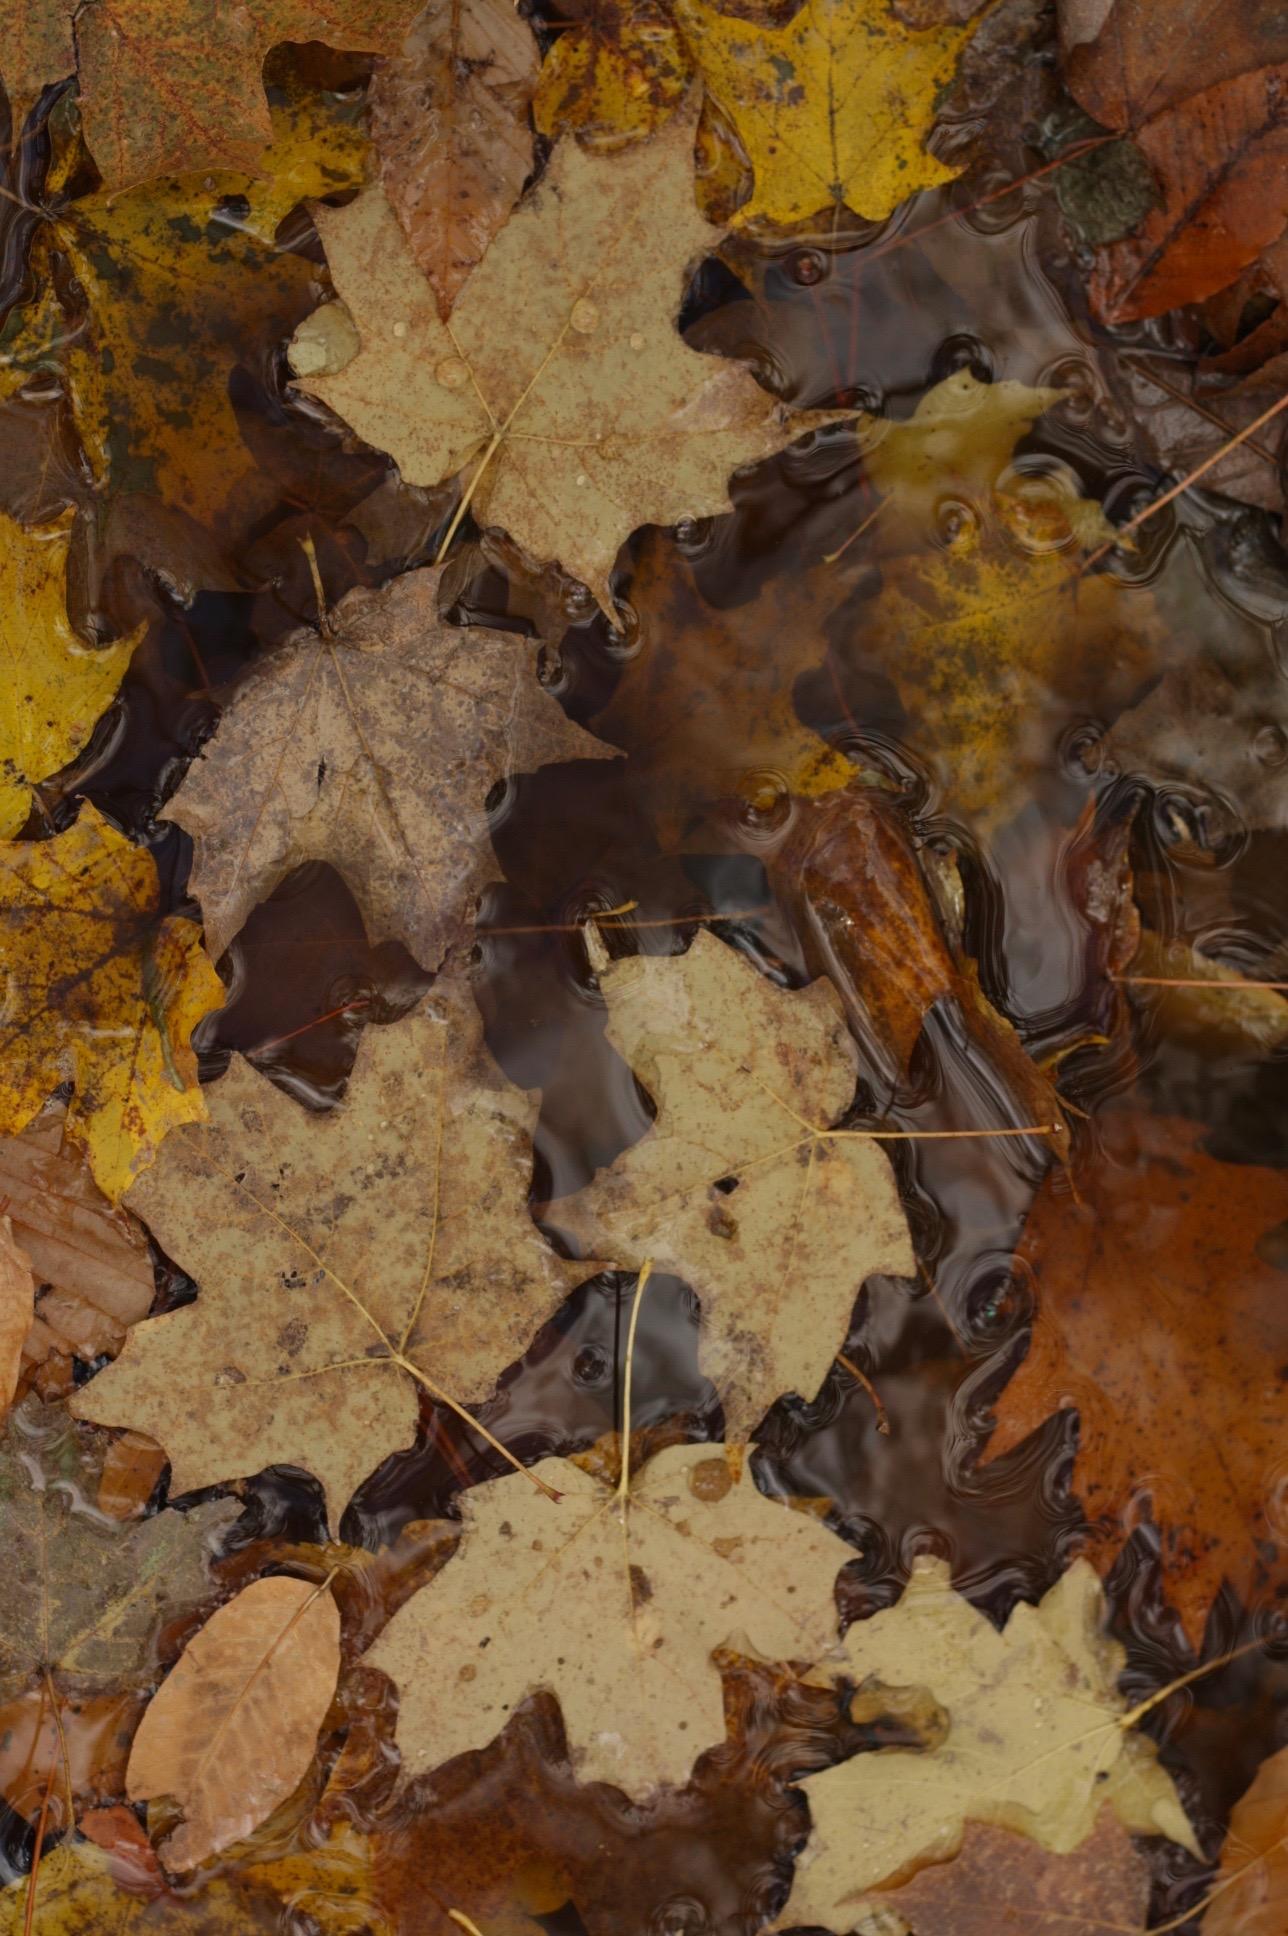 follow-the-fall-figandme.jpg